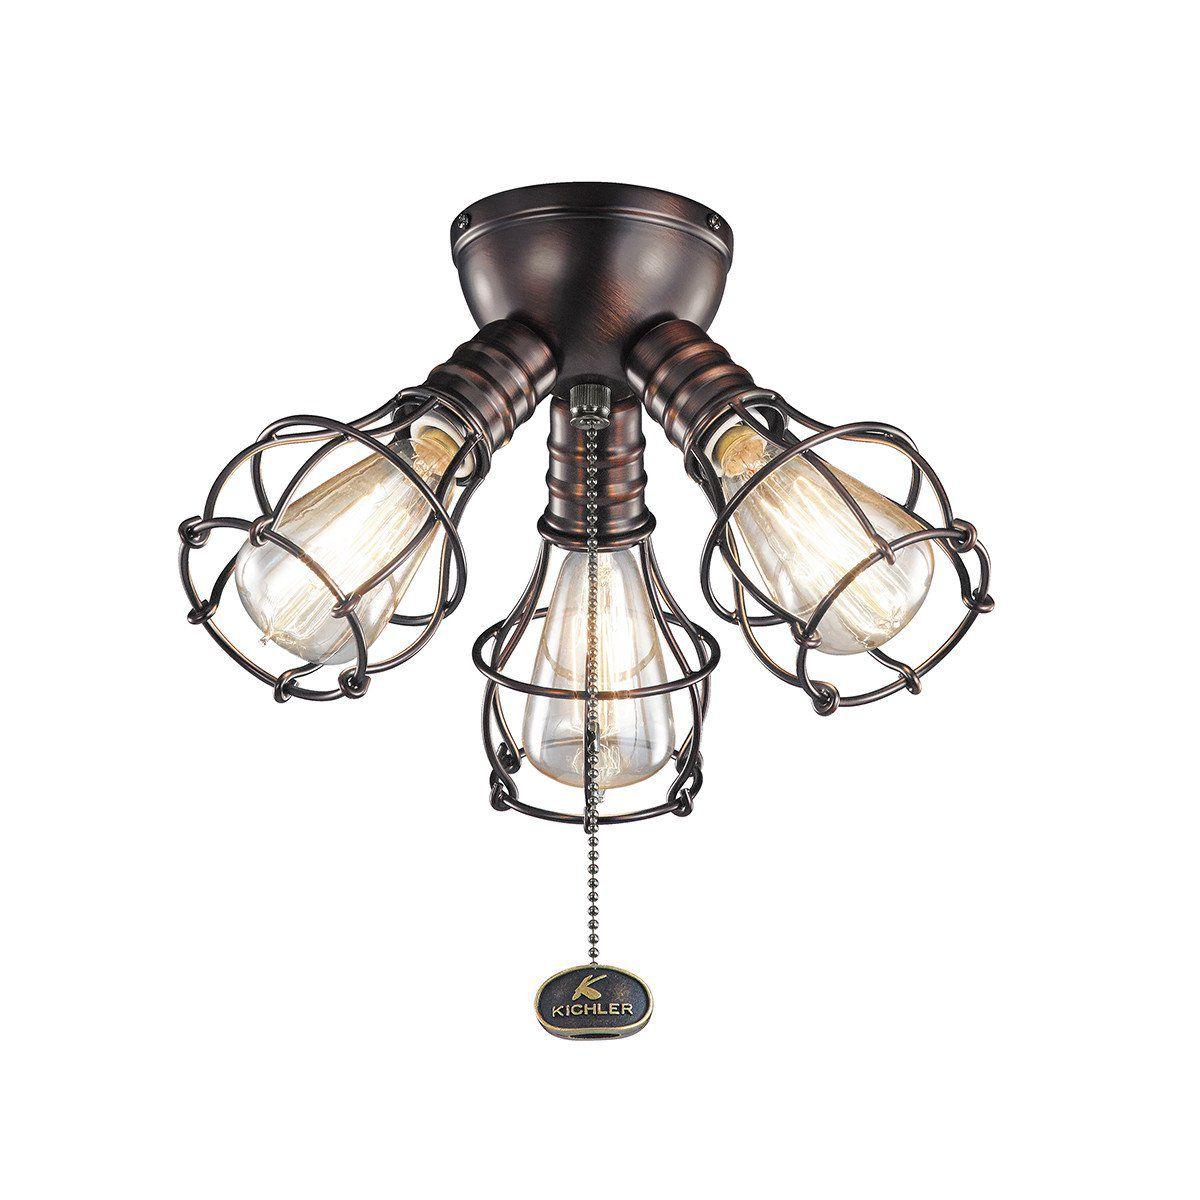 Kichler 370041OBB, Industrial 3 Light Fixture